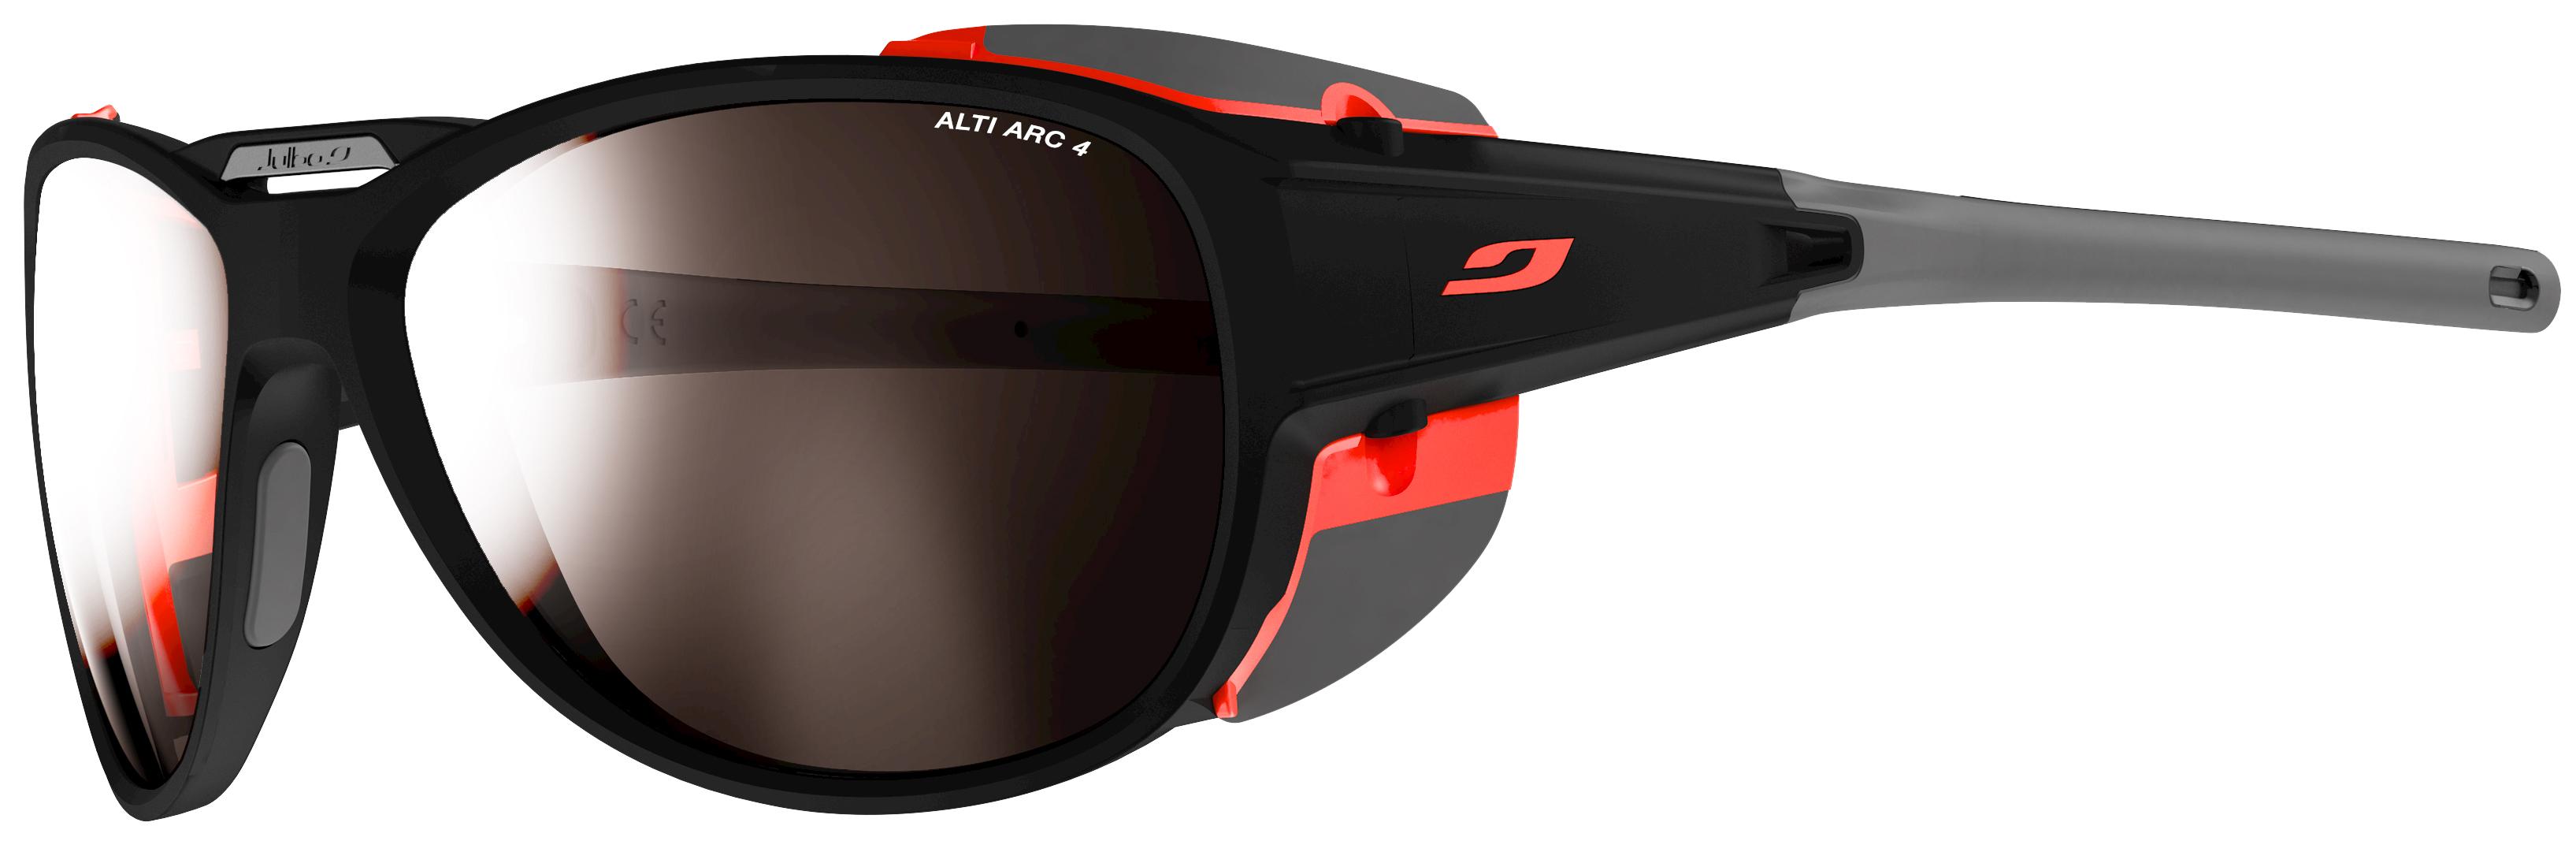 b6fda1b9174 Alpine sunglasses